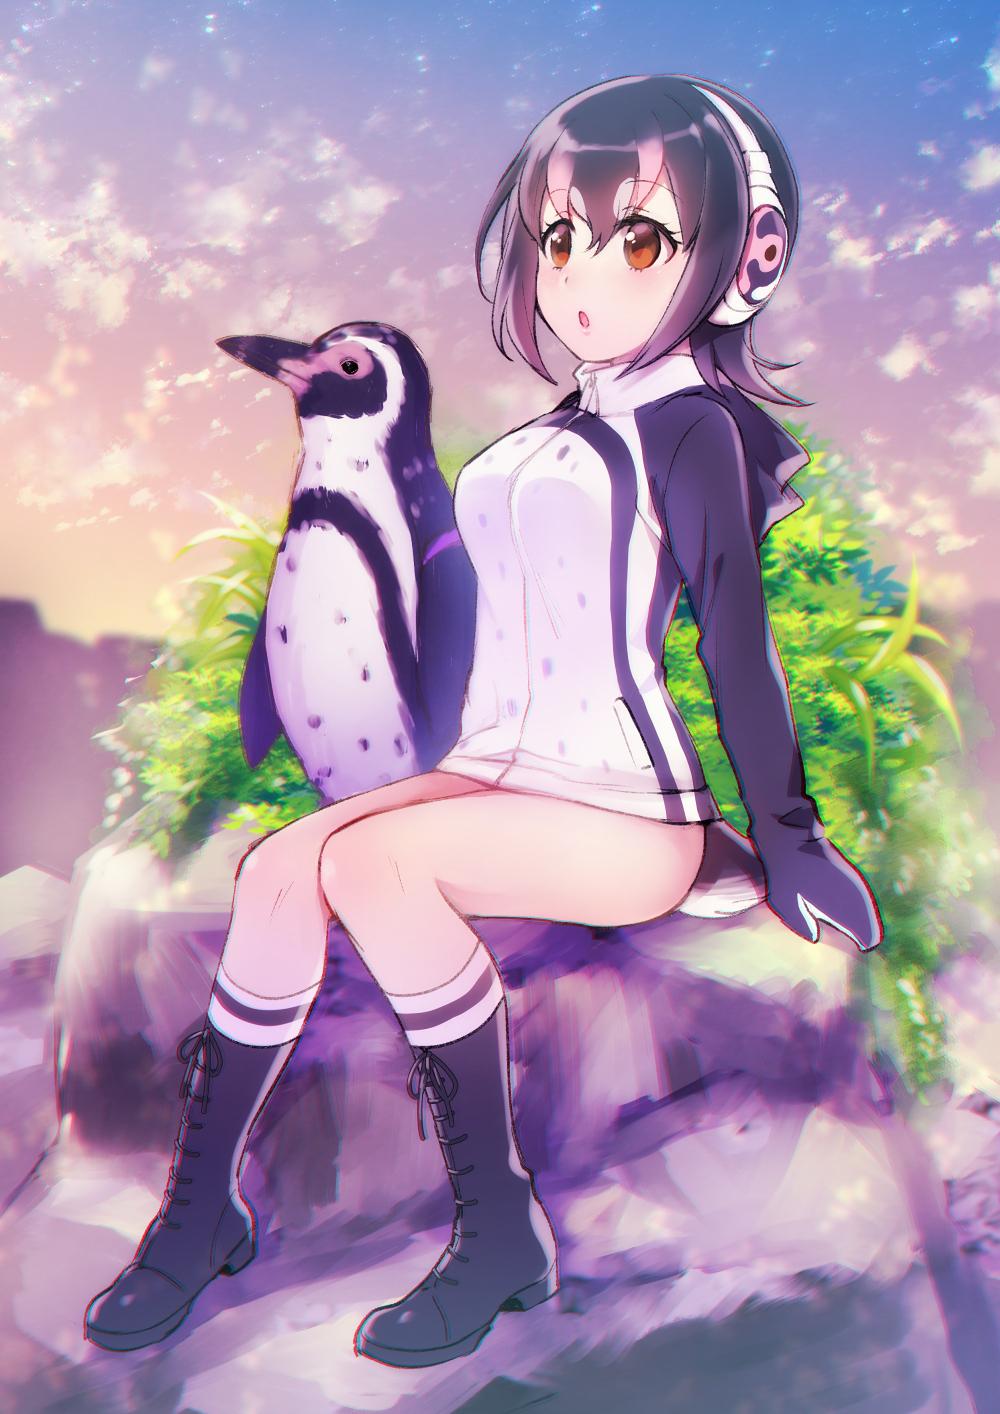 e926 animal_humanoid avian avian_humanoid bird black_hair duo female feral grape-kun hair humanoid humboldt_penguin humboldt_penguin_(kemono_friends) kemono_friends male orange_eyes outside penguin ねめ